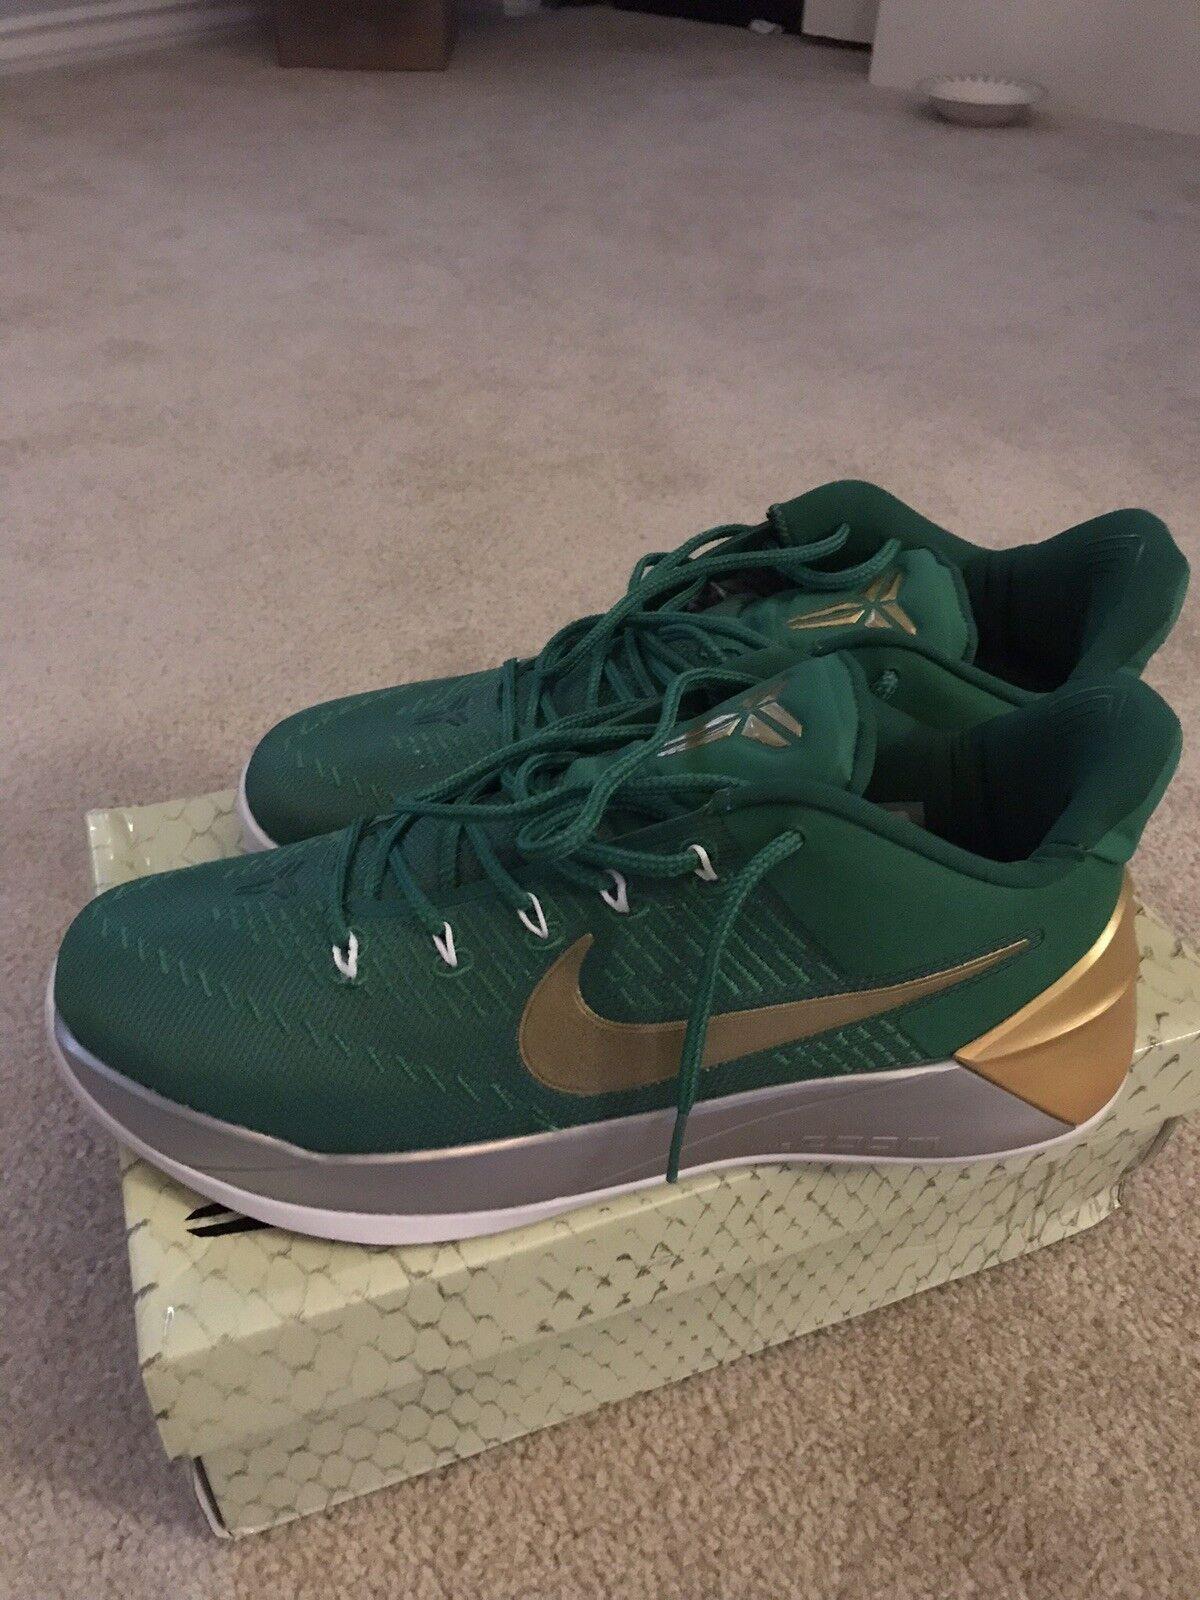 Nike Kobe AD Boston Celtics